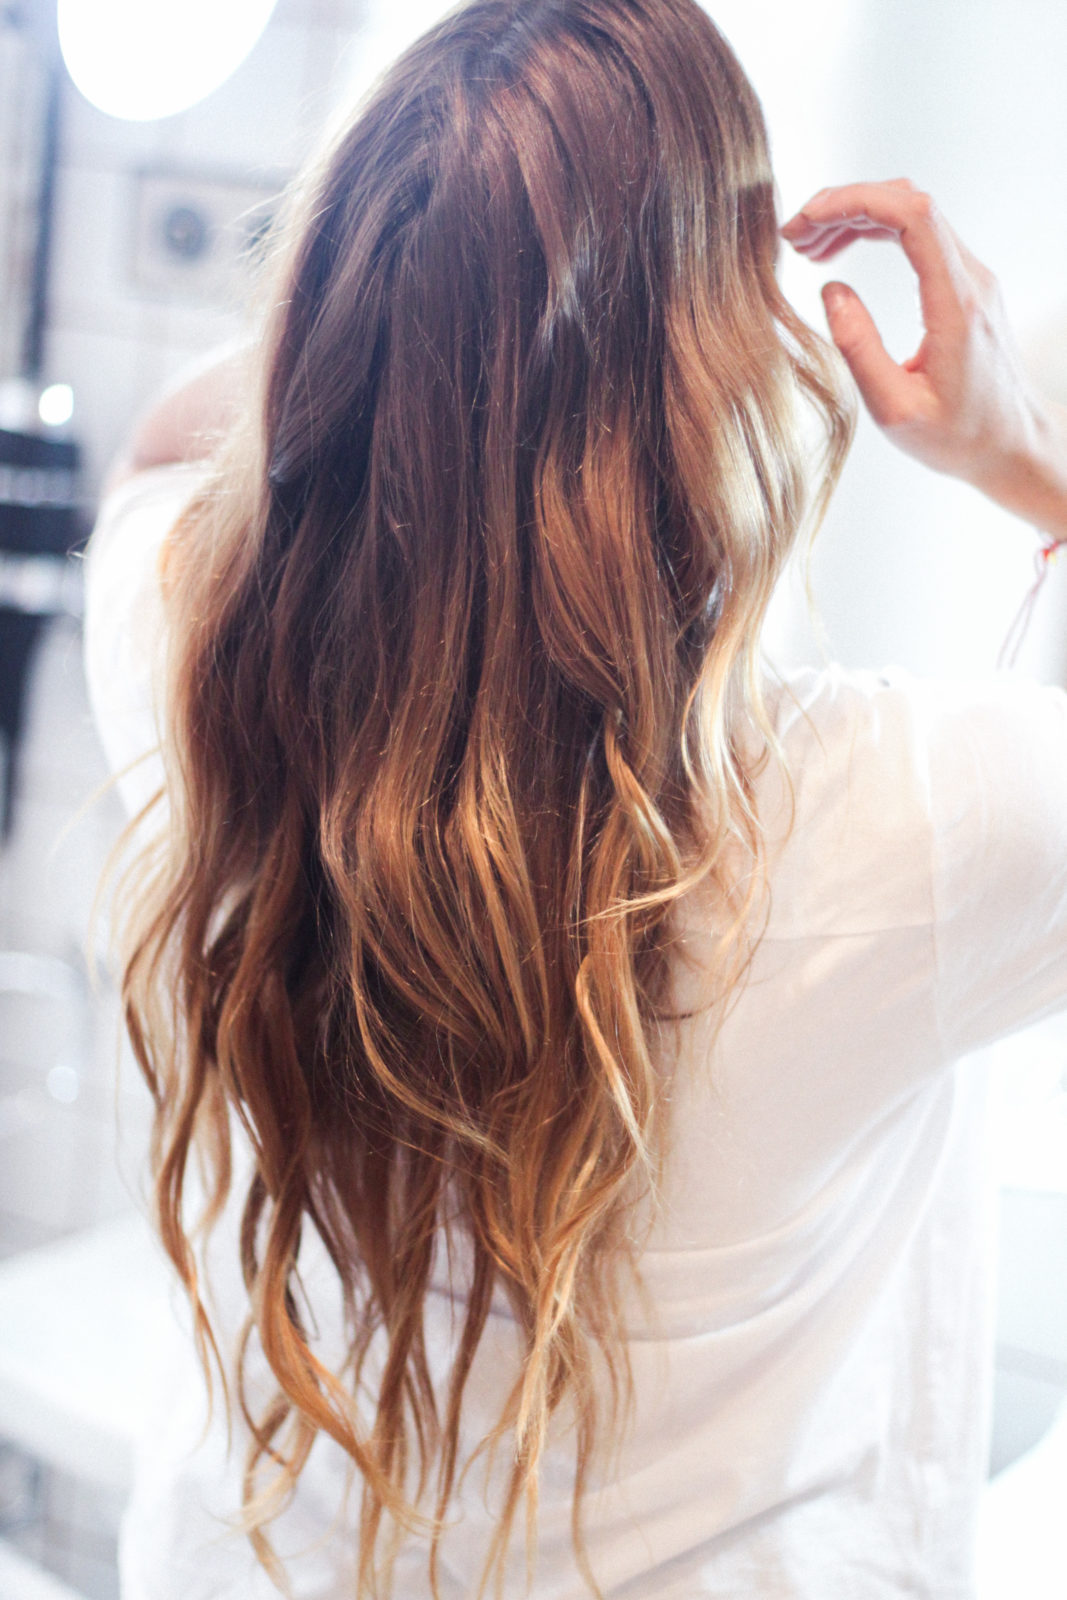 sapphire_curler_irresistibleme_hair_style-36